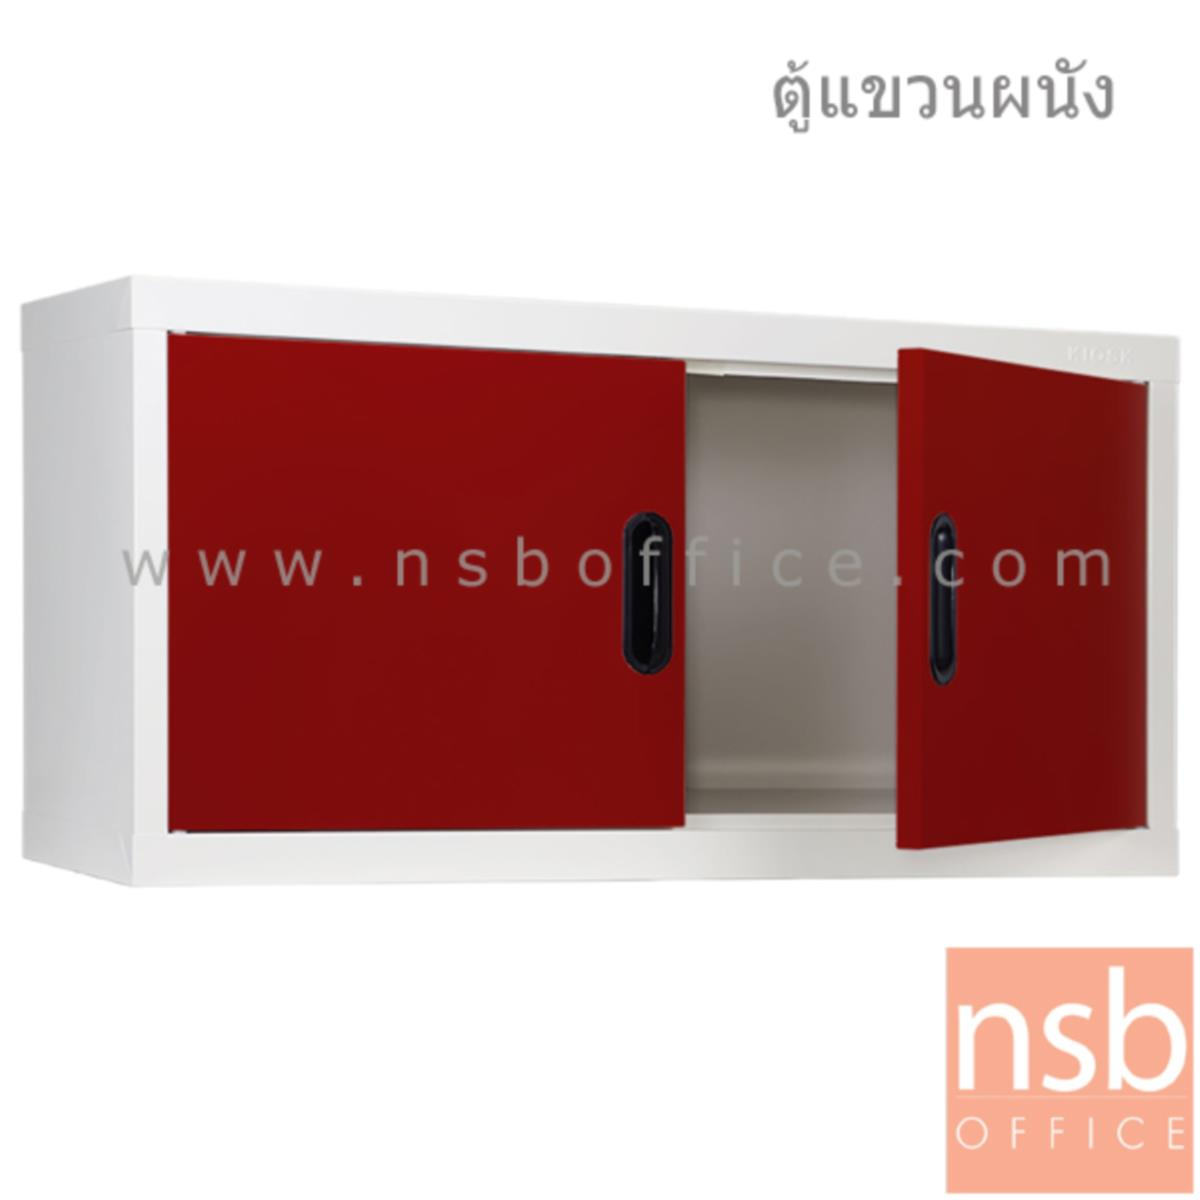 E25A017:ตู้เหล็กแขวนลอย 2 บานเปิดทึบ  รุ่น MAX-011 ขนาด 88W*44H cm.